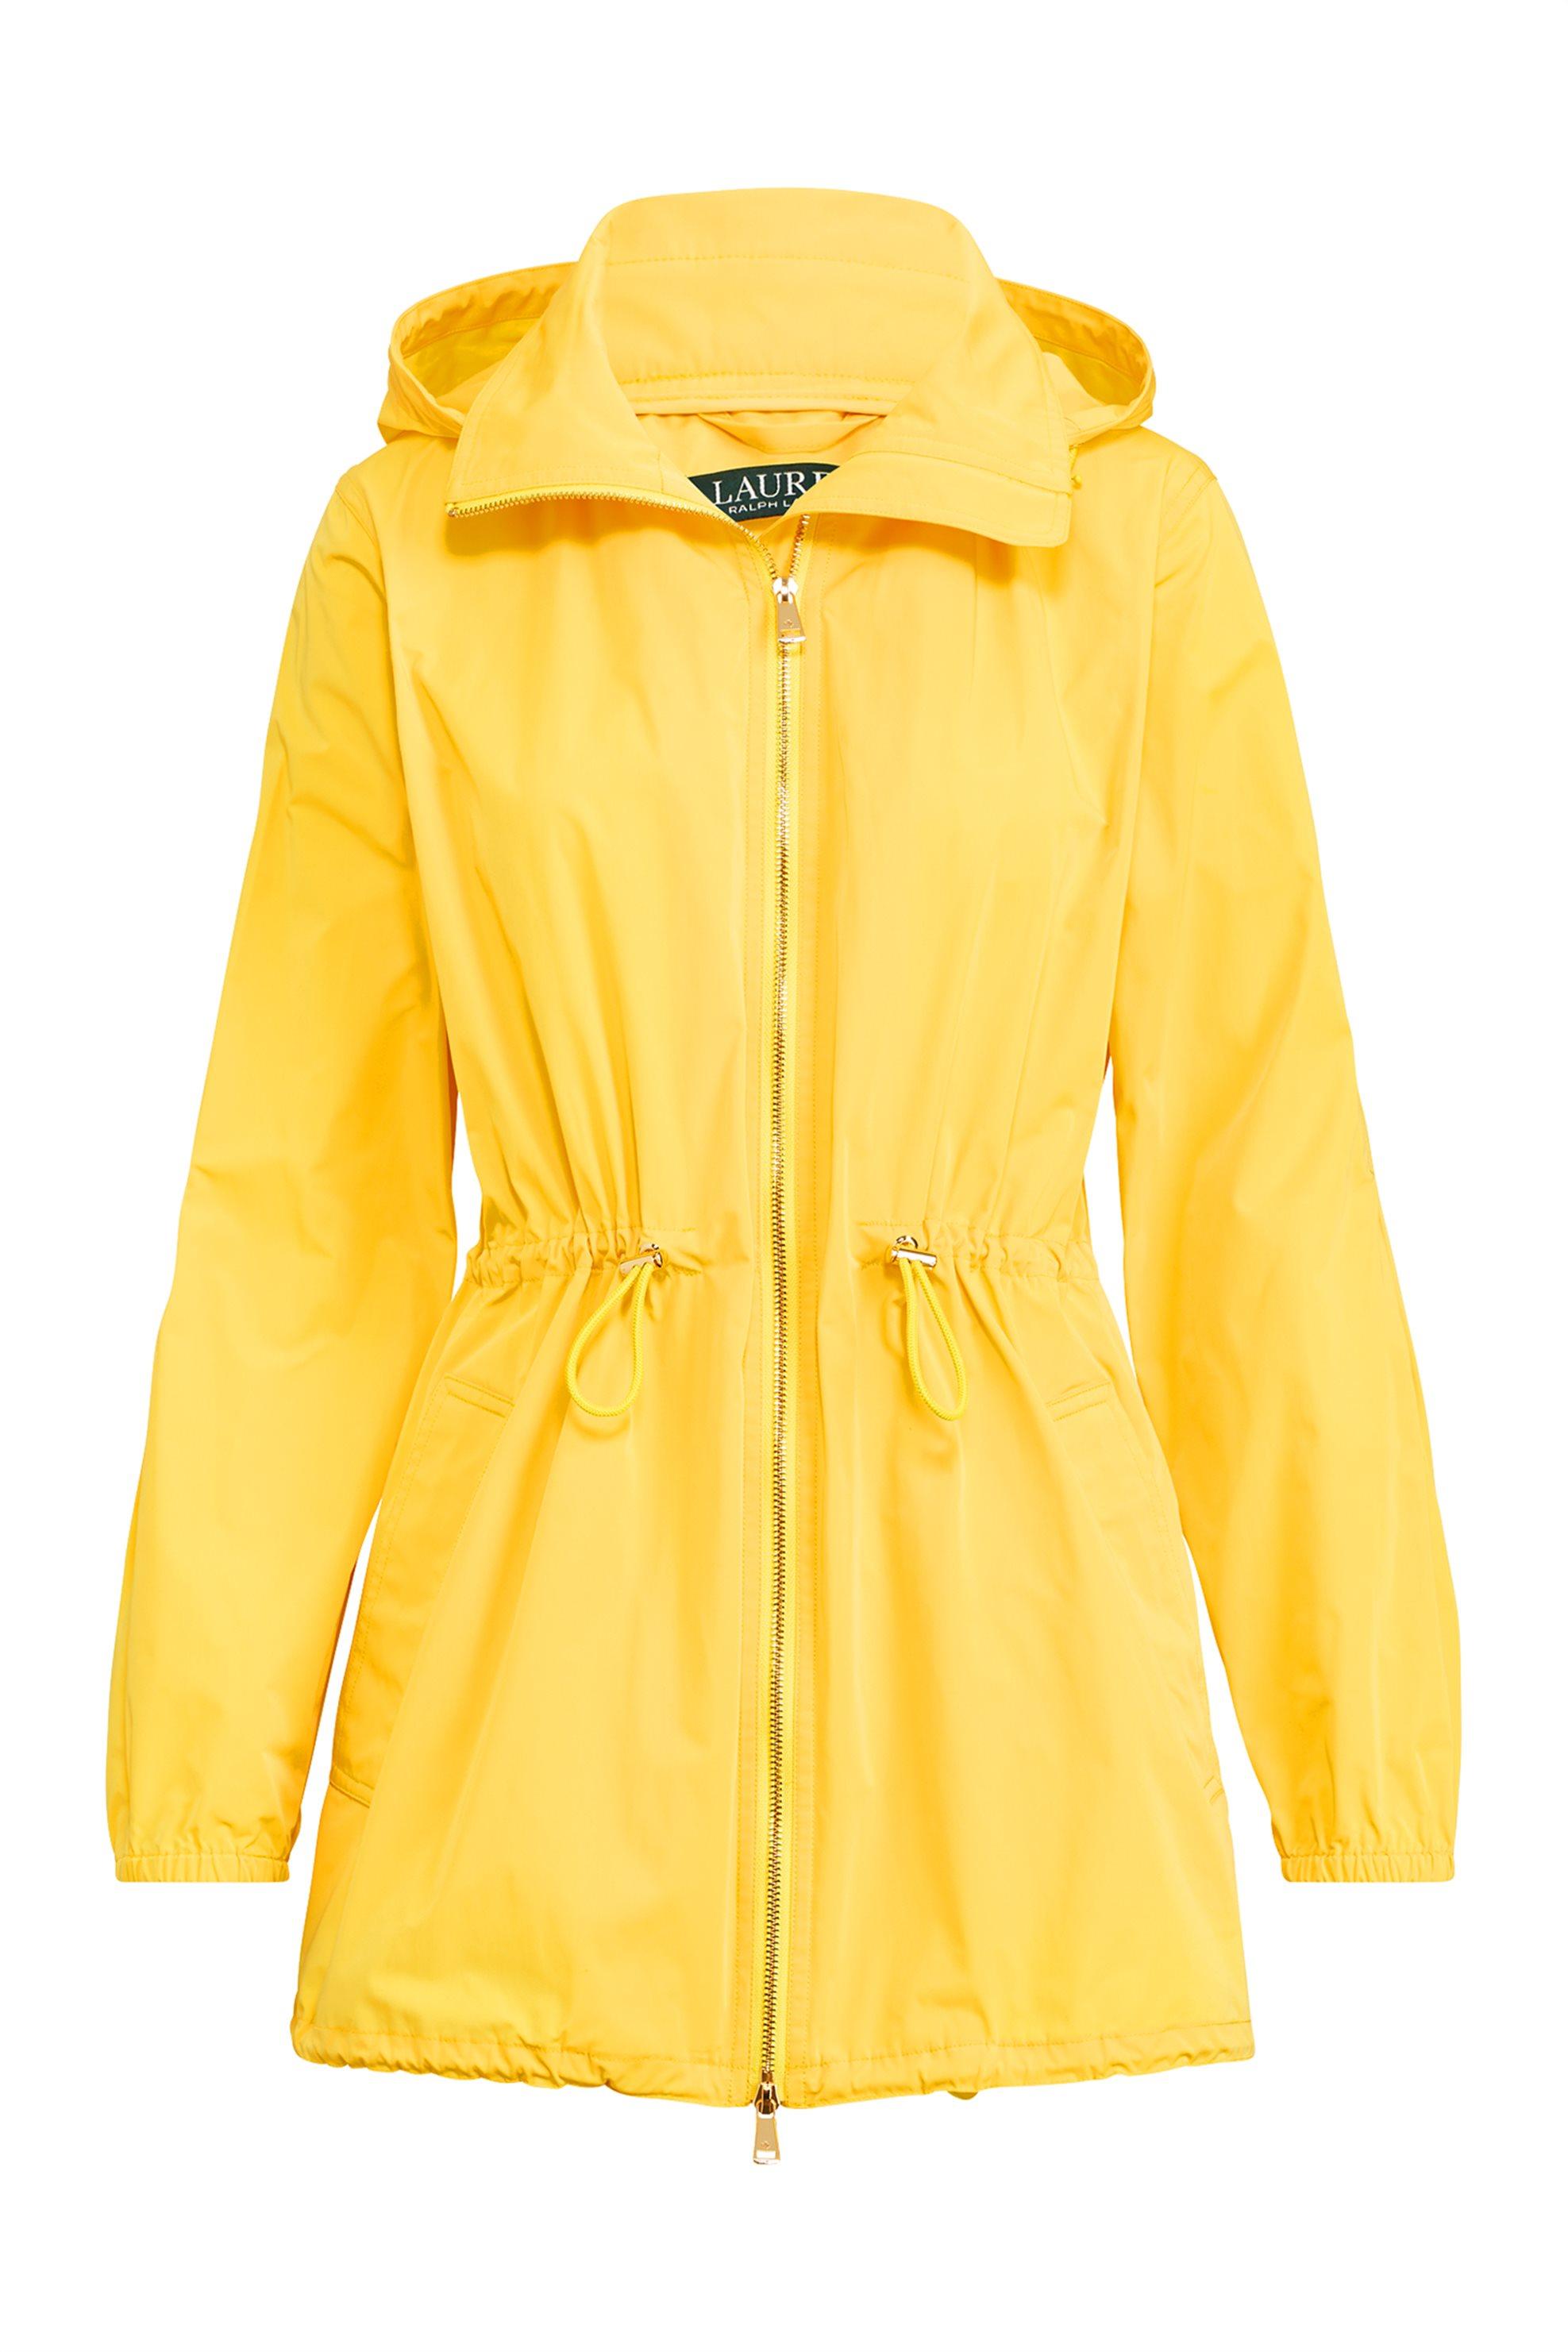 0bf4fca8a4a Lauren Ralph Lauren γυναικείo αδιάβροχο jacket με κουκούλα - 200725805002 -  Κίτρ